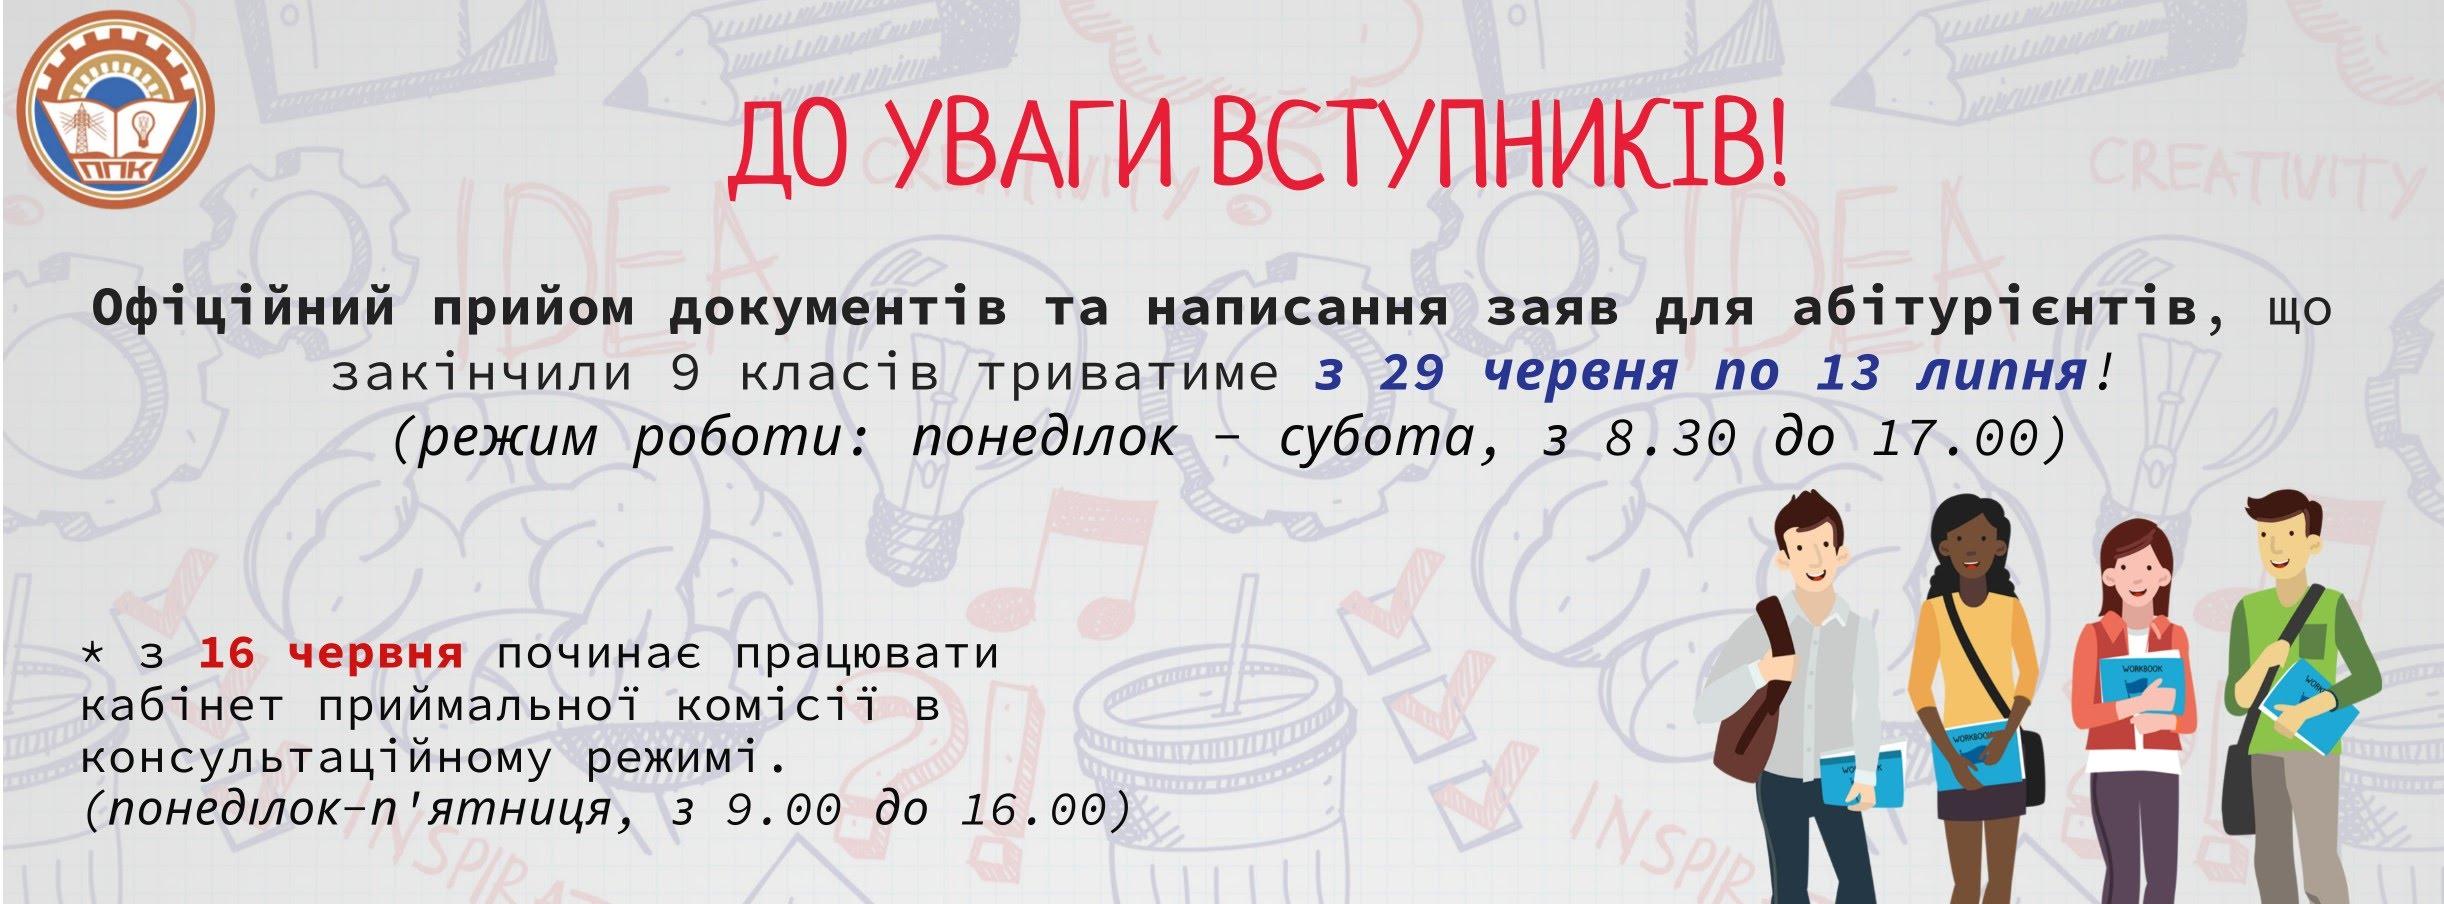 https://sites.google.com/a/polytechnic.co.cc/ppk/informacia-dla-abiturientiv